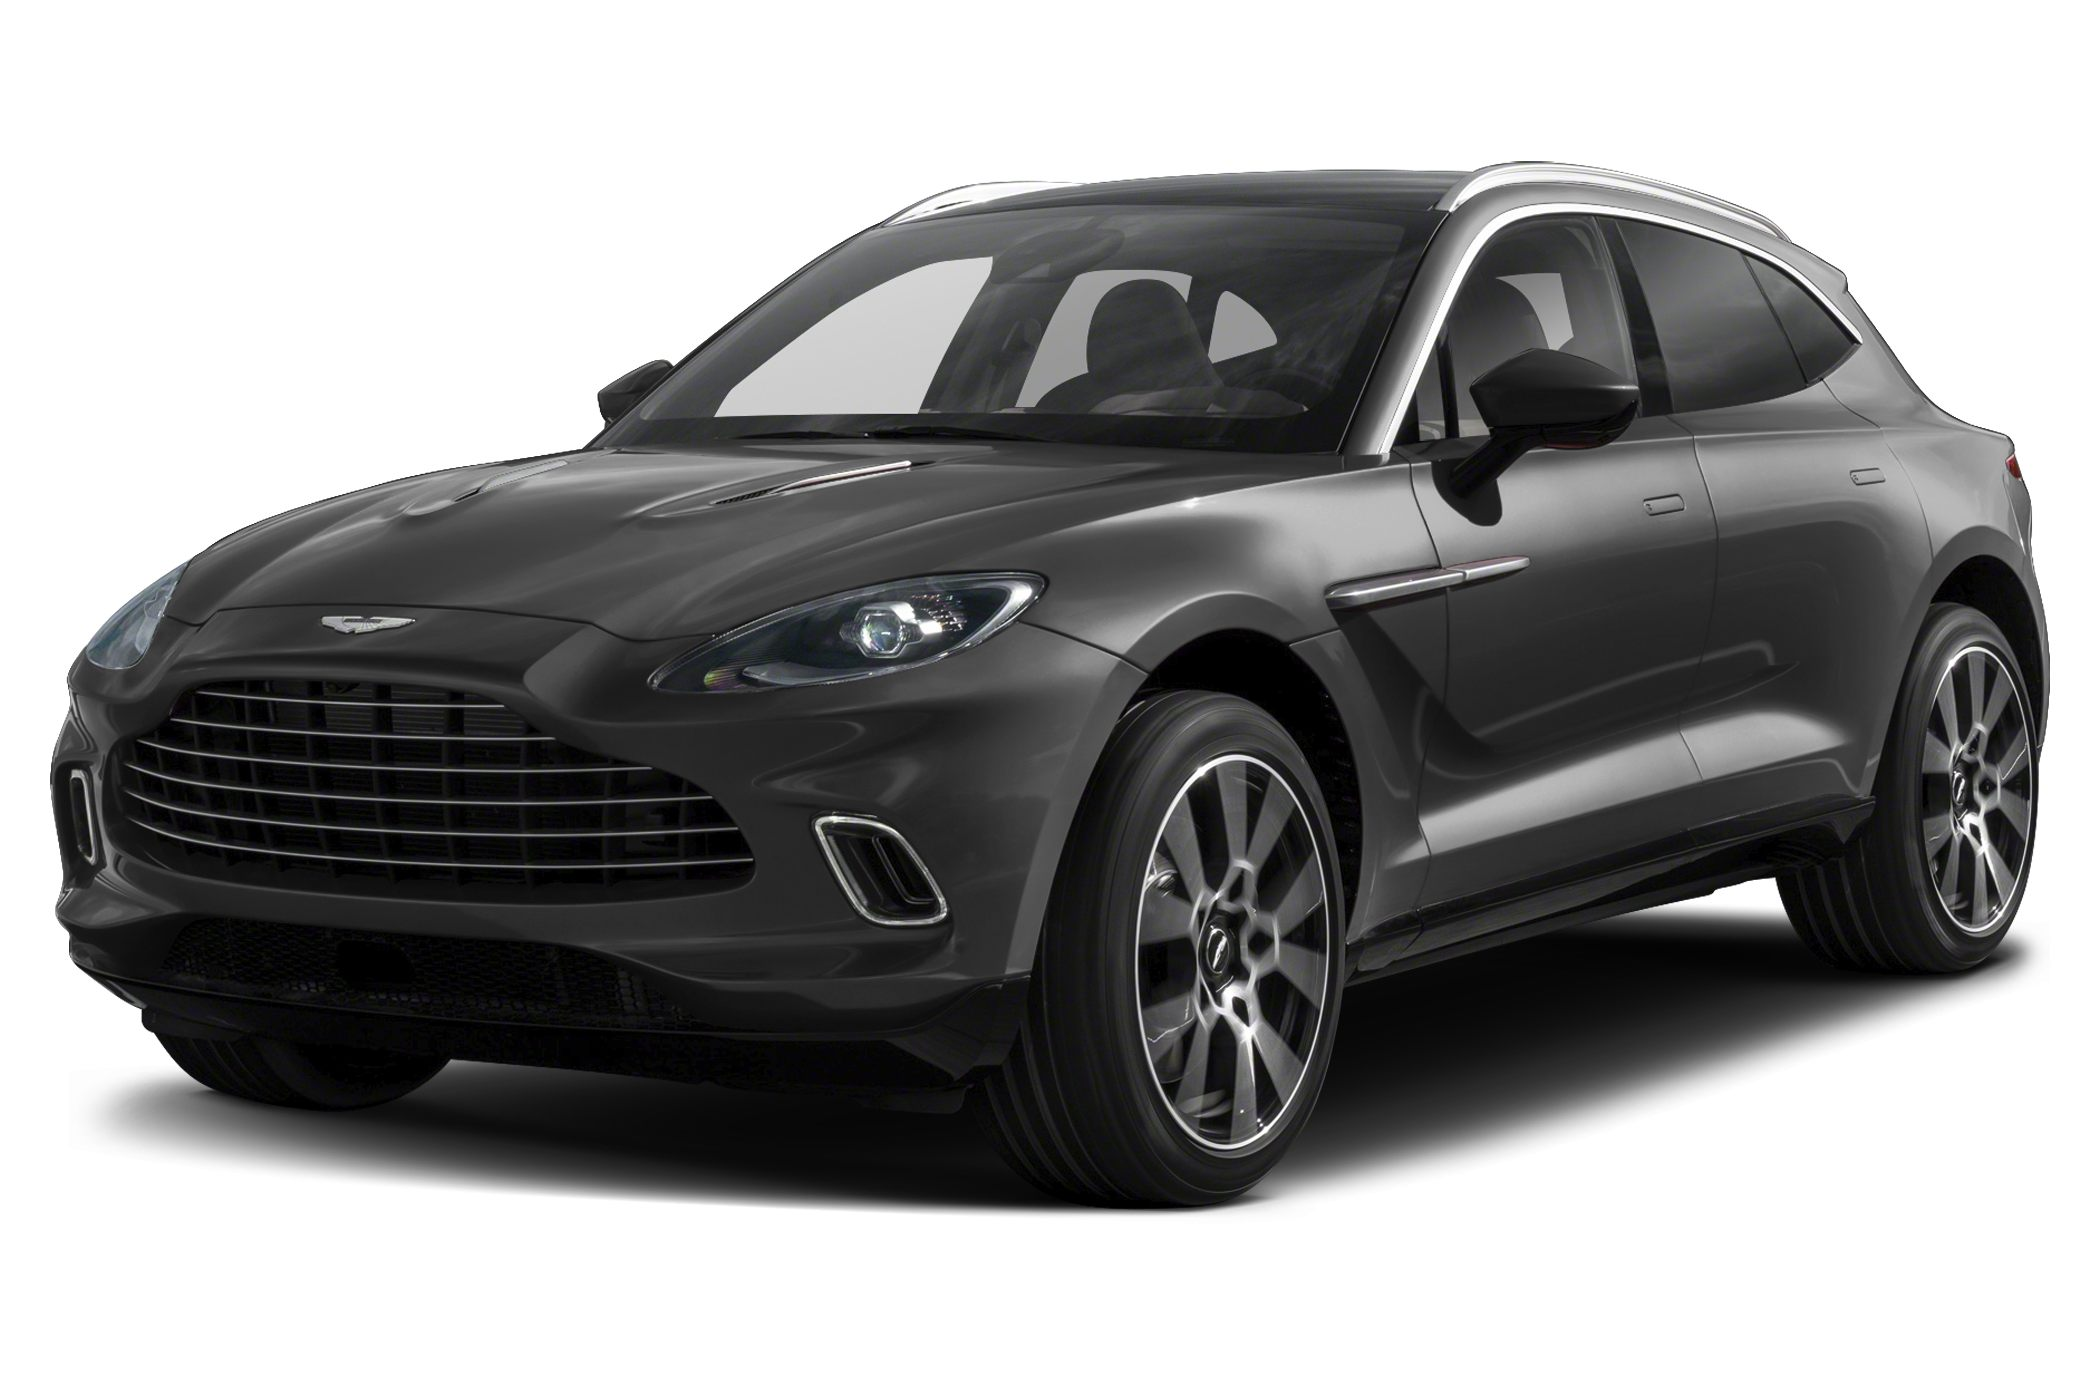 2021 Aston Martin Dbx Base 4x4 Sport Utility Safety Recalls